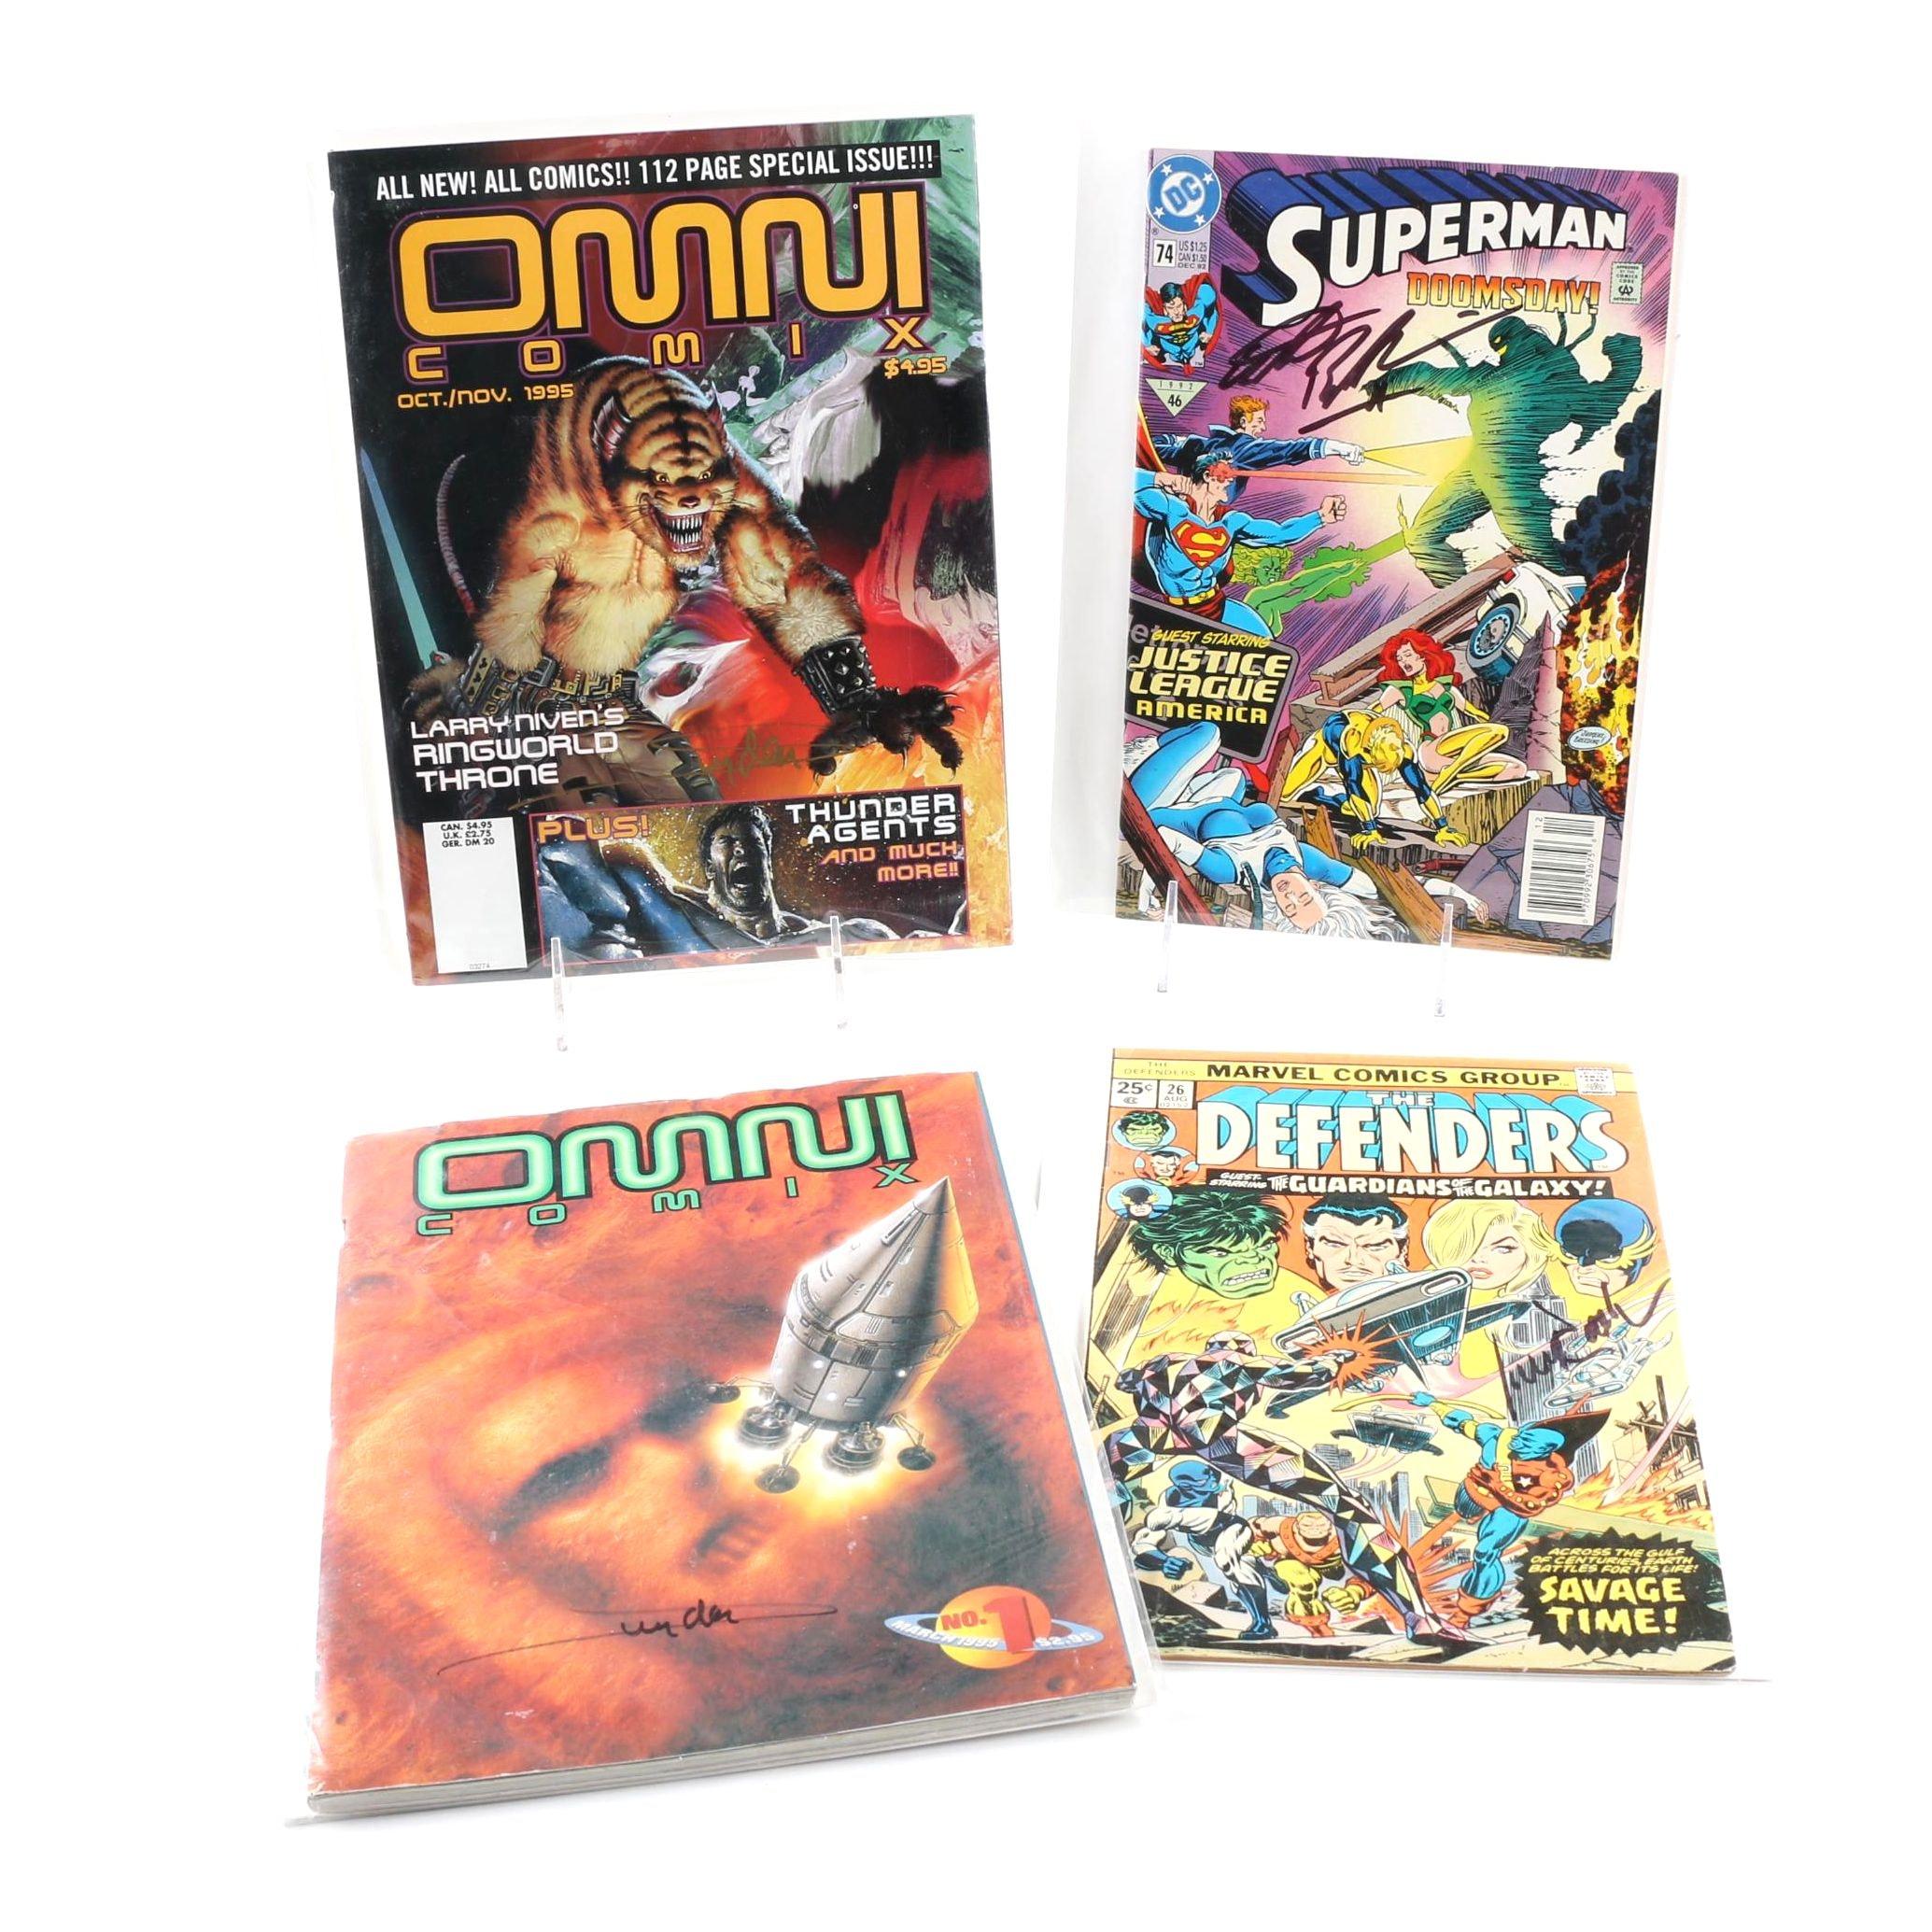 Michael Rooker, Adam Baldwin, Arthur Suydam Signed Comic Books